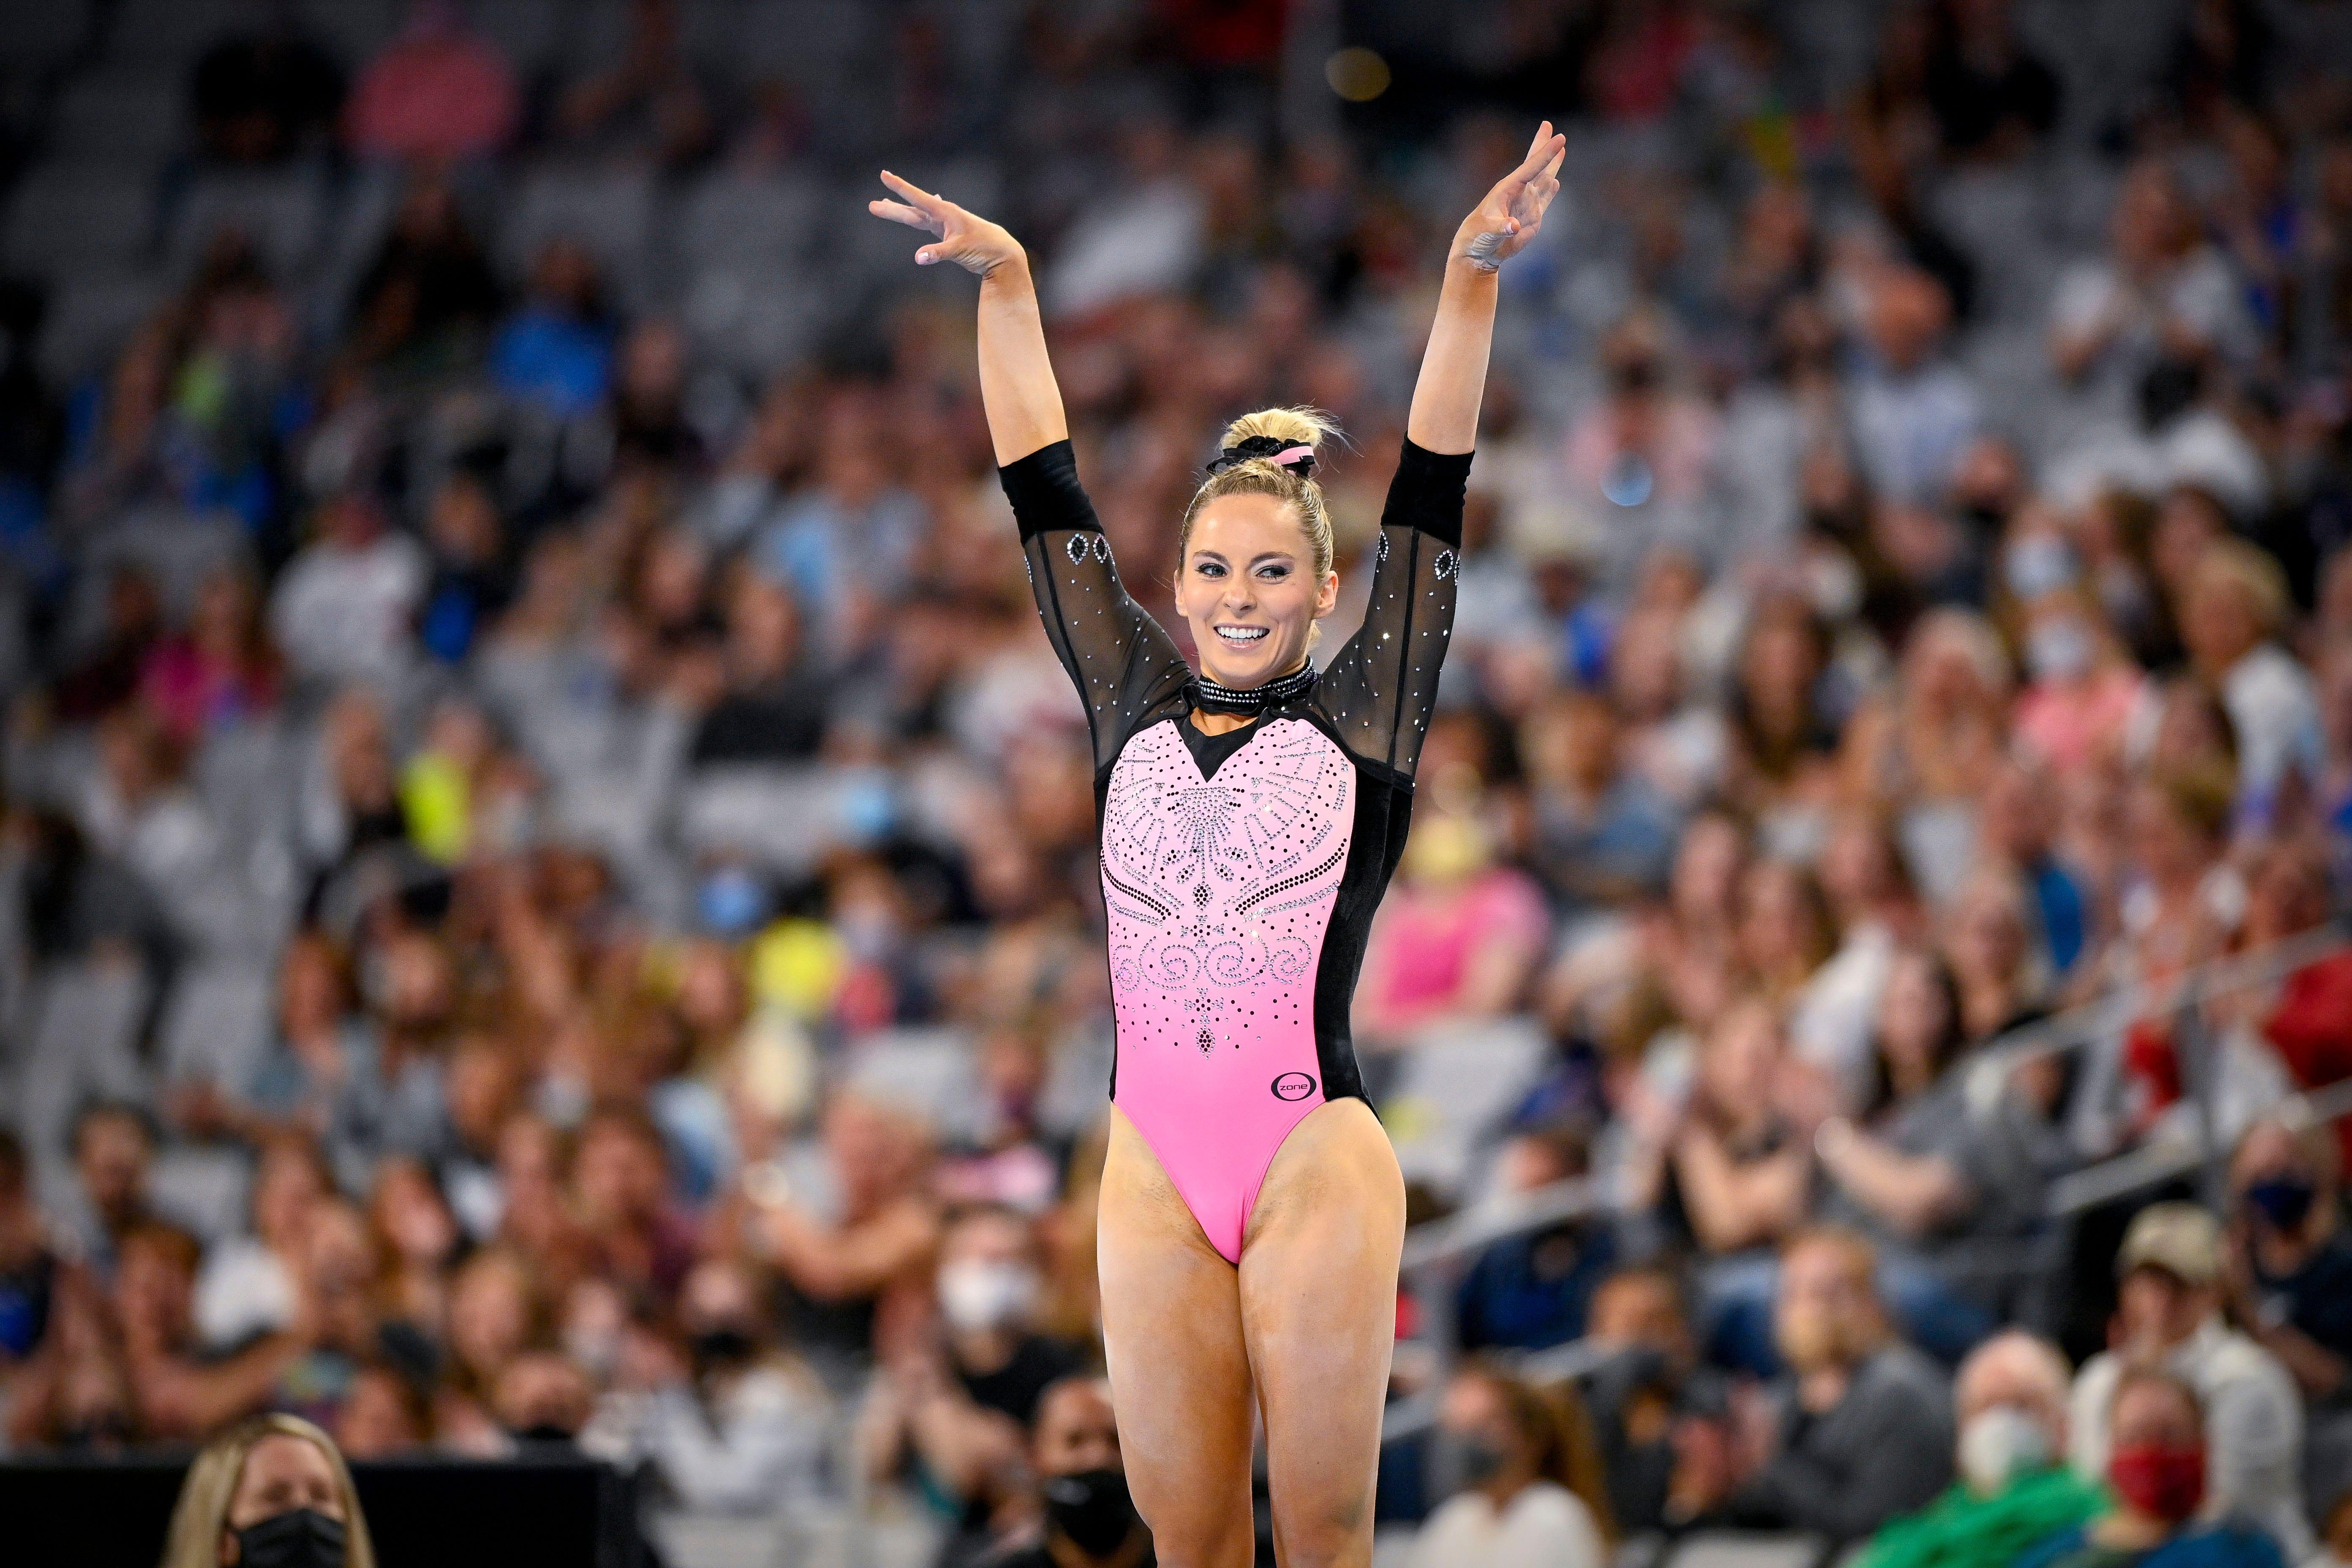 Gymnast MyKayla Skinner of Desert Lights